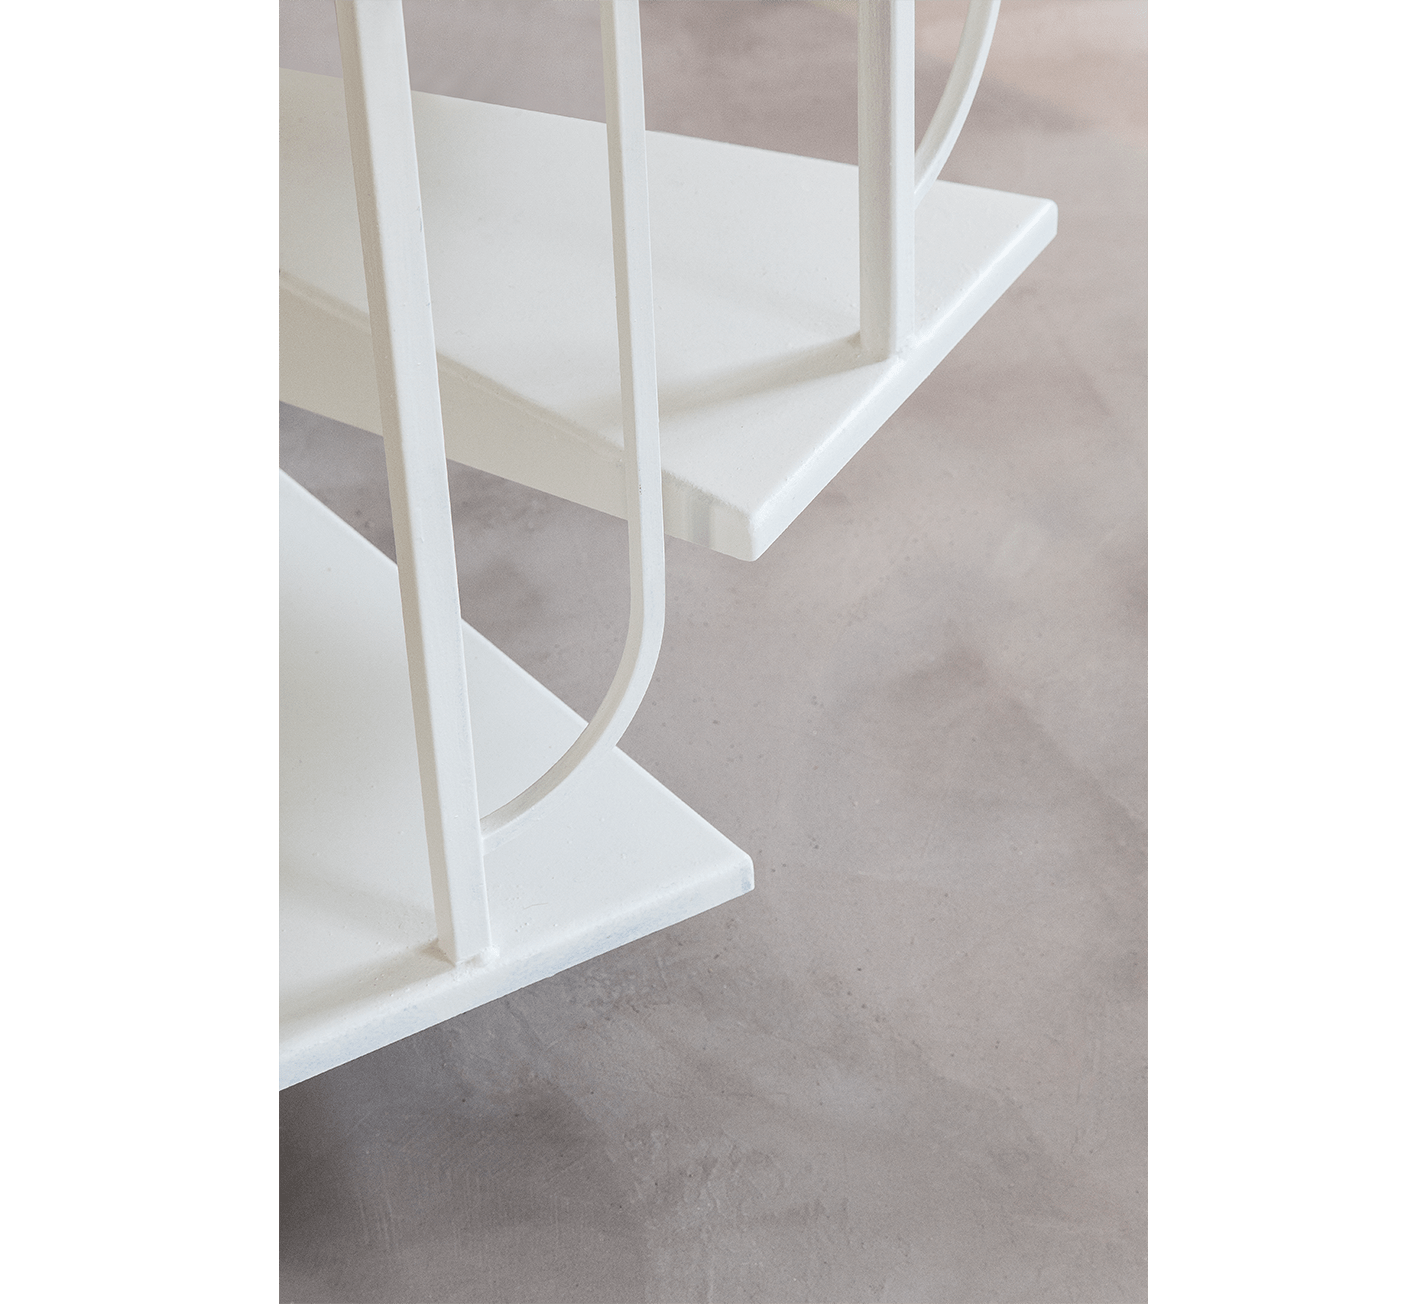 Projet-Germaine-Atelier-Steve-Pauline-Borgia-Architecte-interieur-13-min